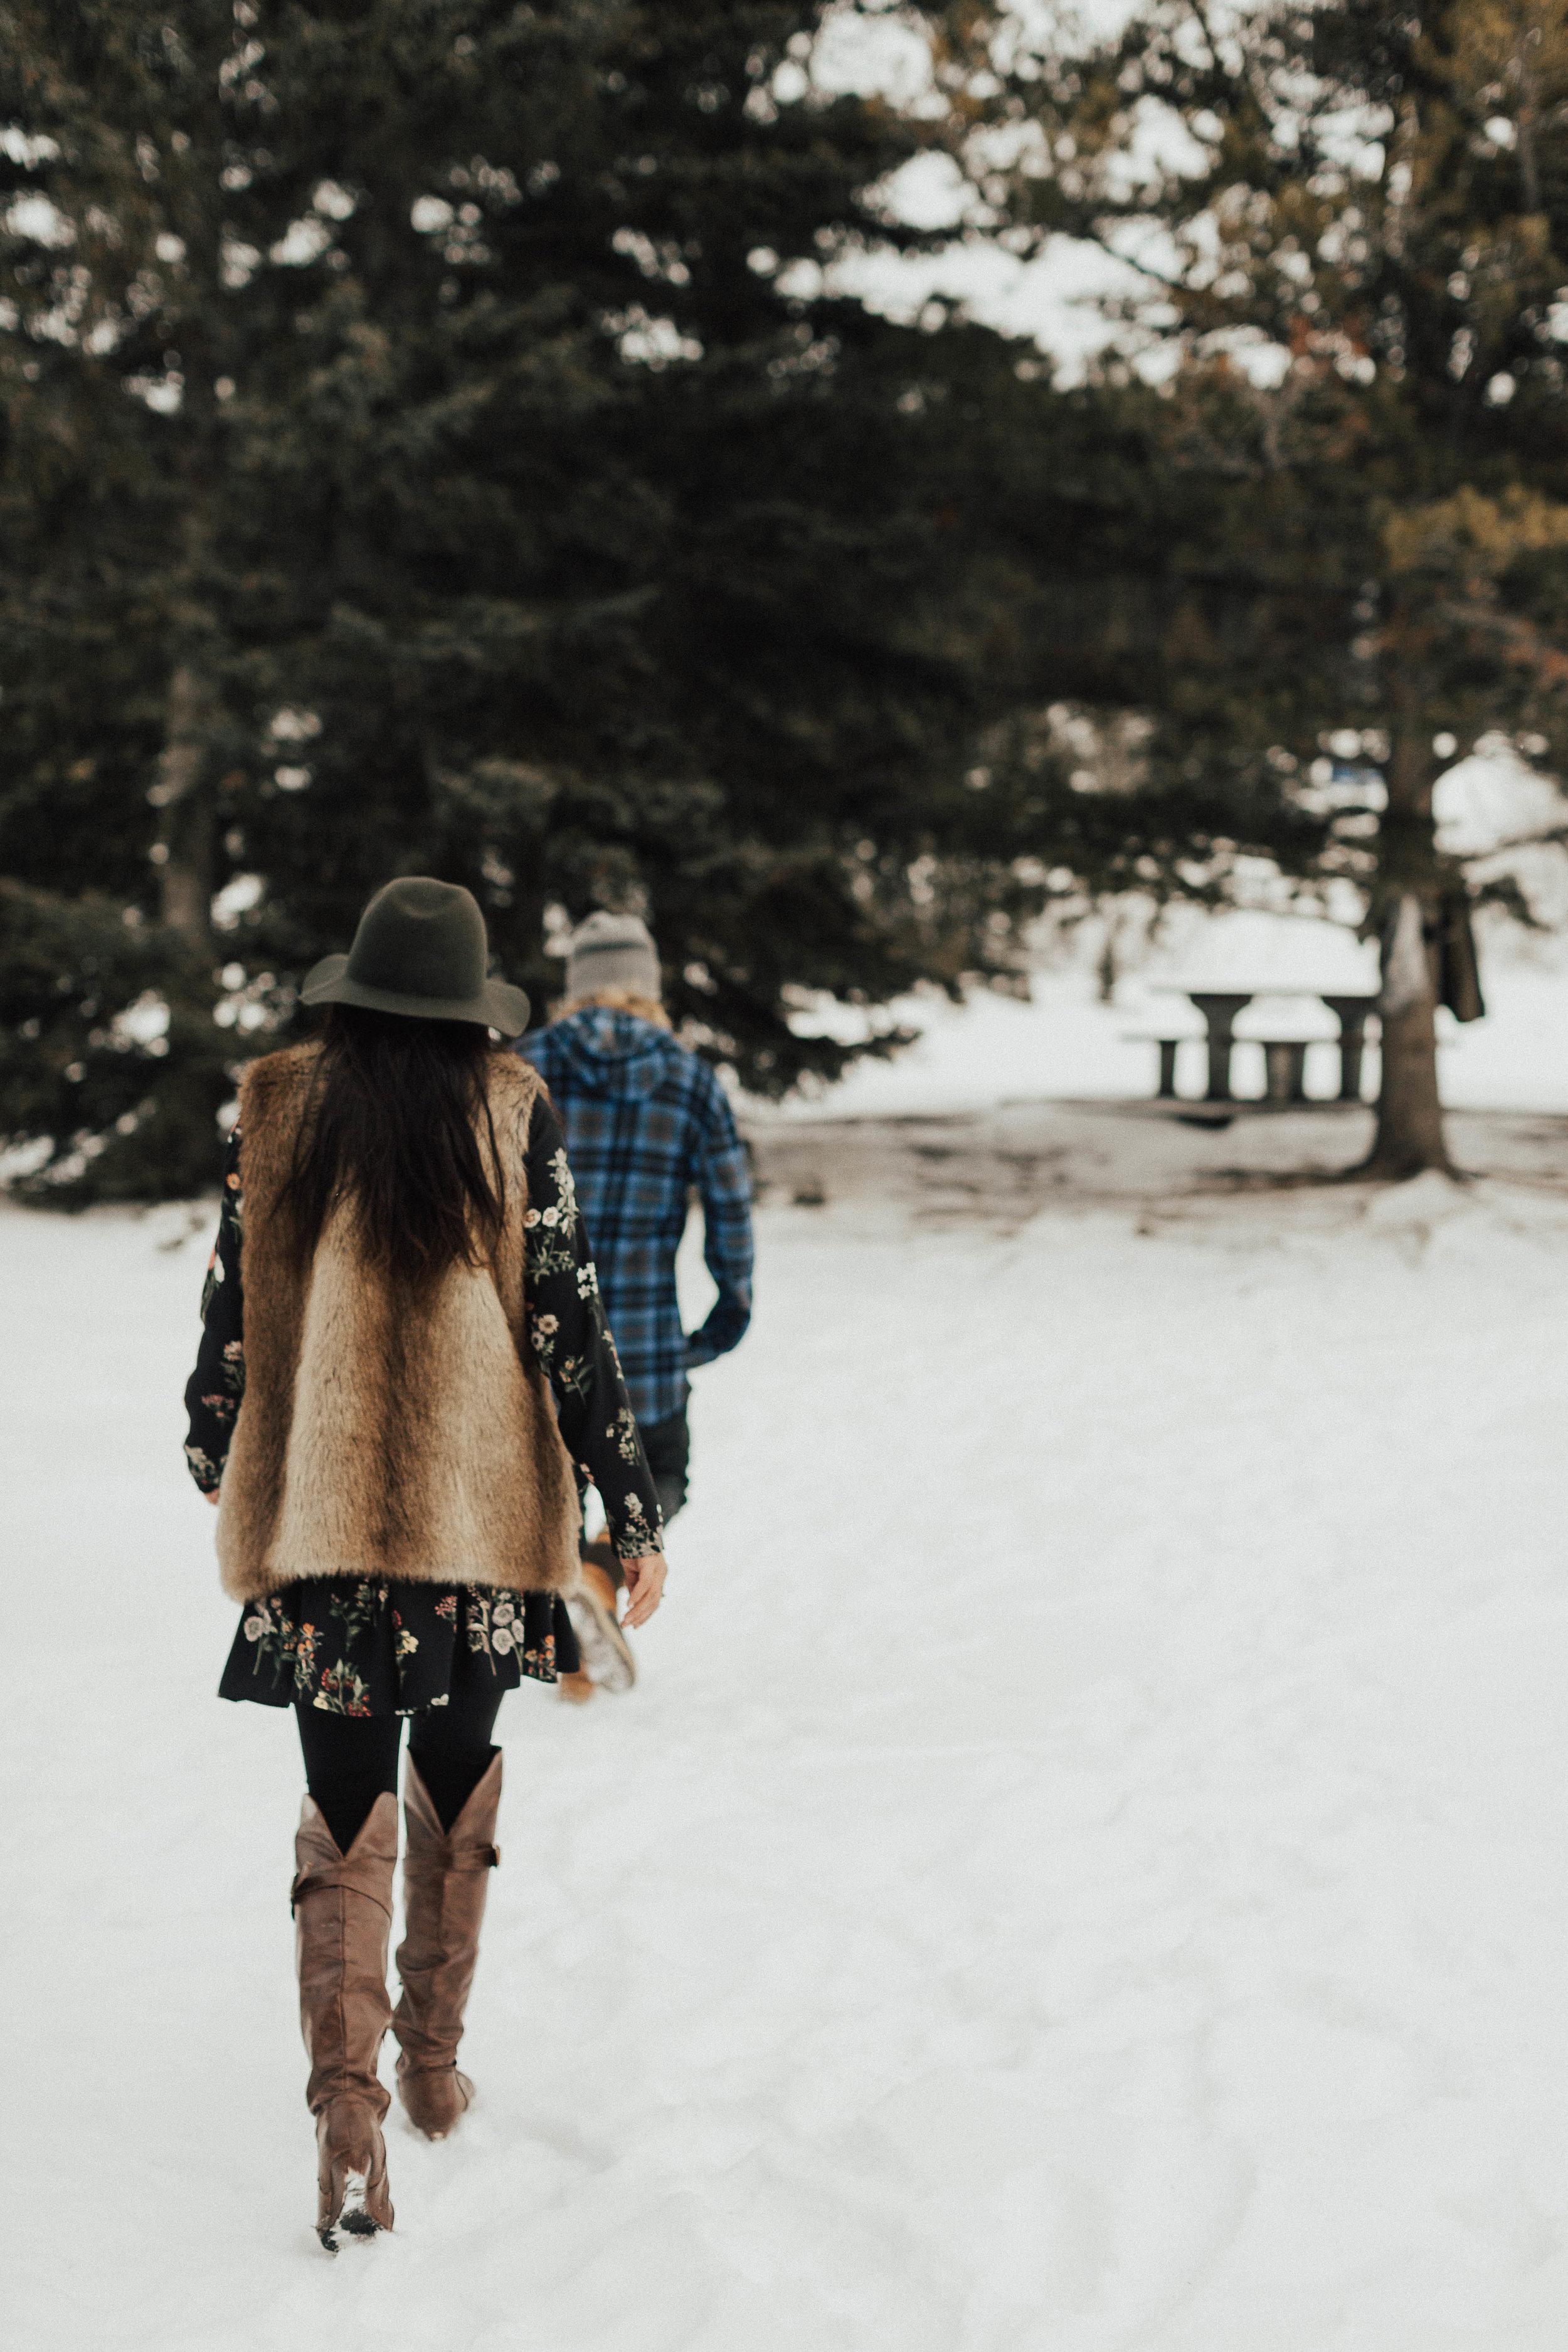 Banff Engagement Photographer - Winter Mountain Adventure Engagement Session - Michelle Larmand Photography-031